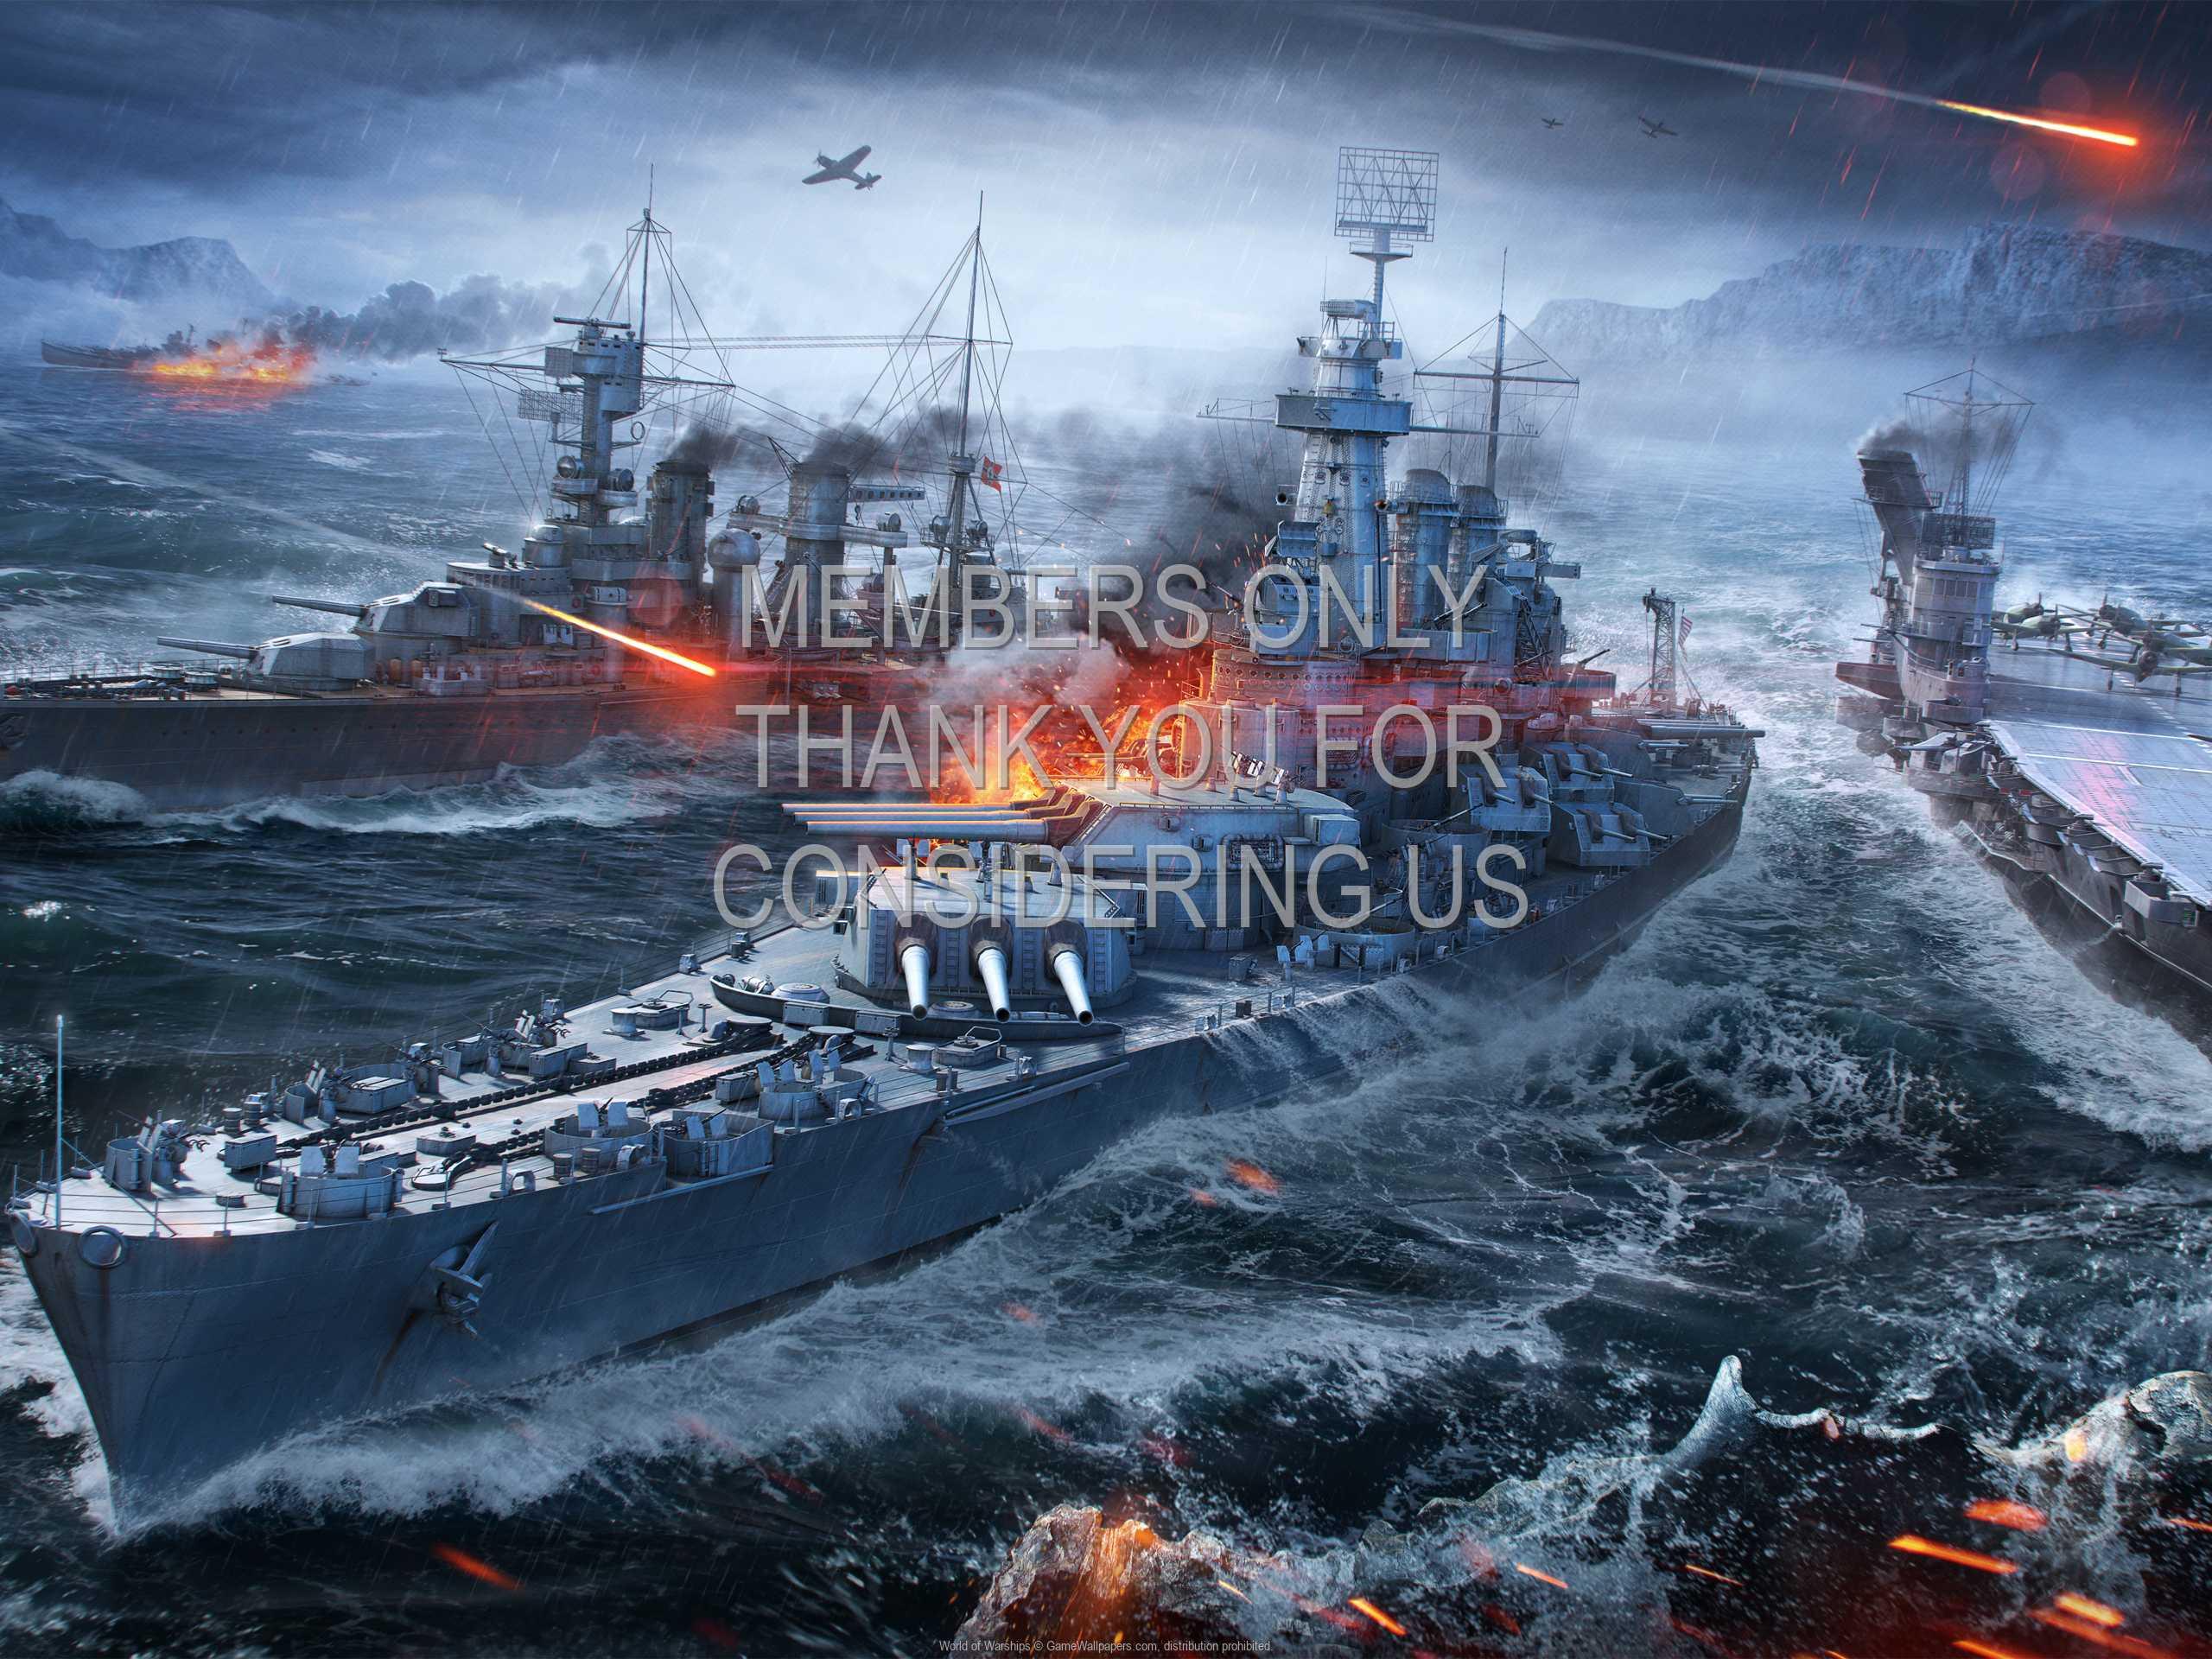 World of Warships 1080p Horizontal Mobile wallpaper or background 09